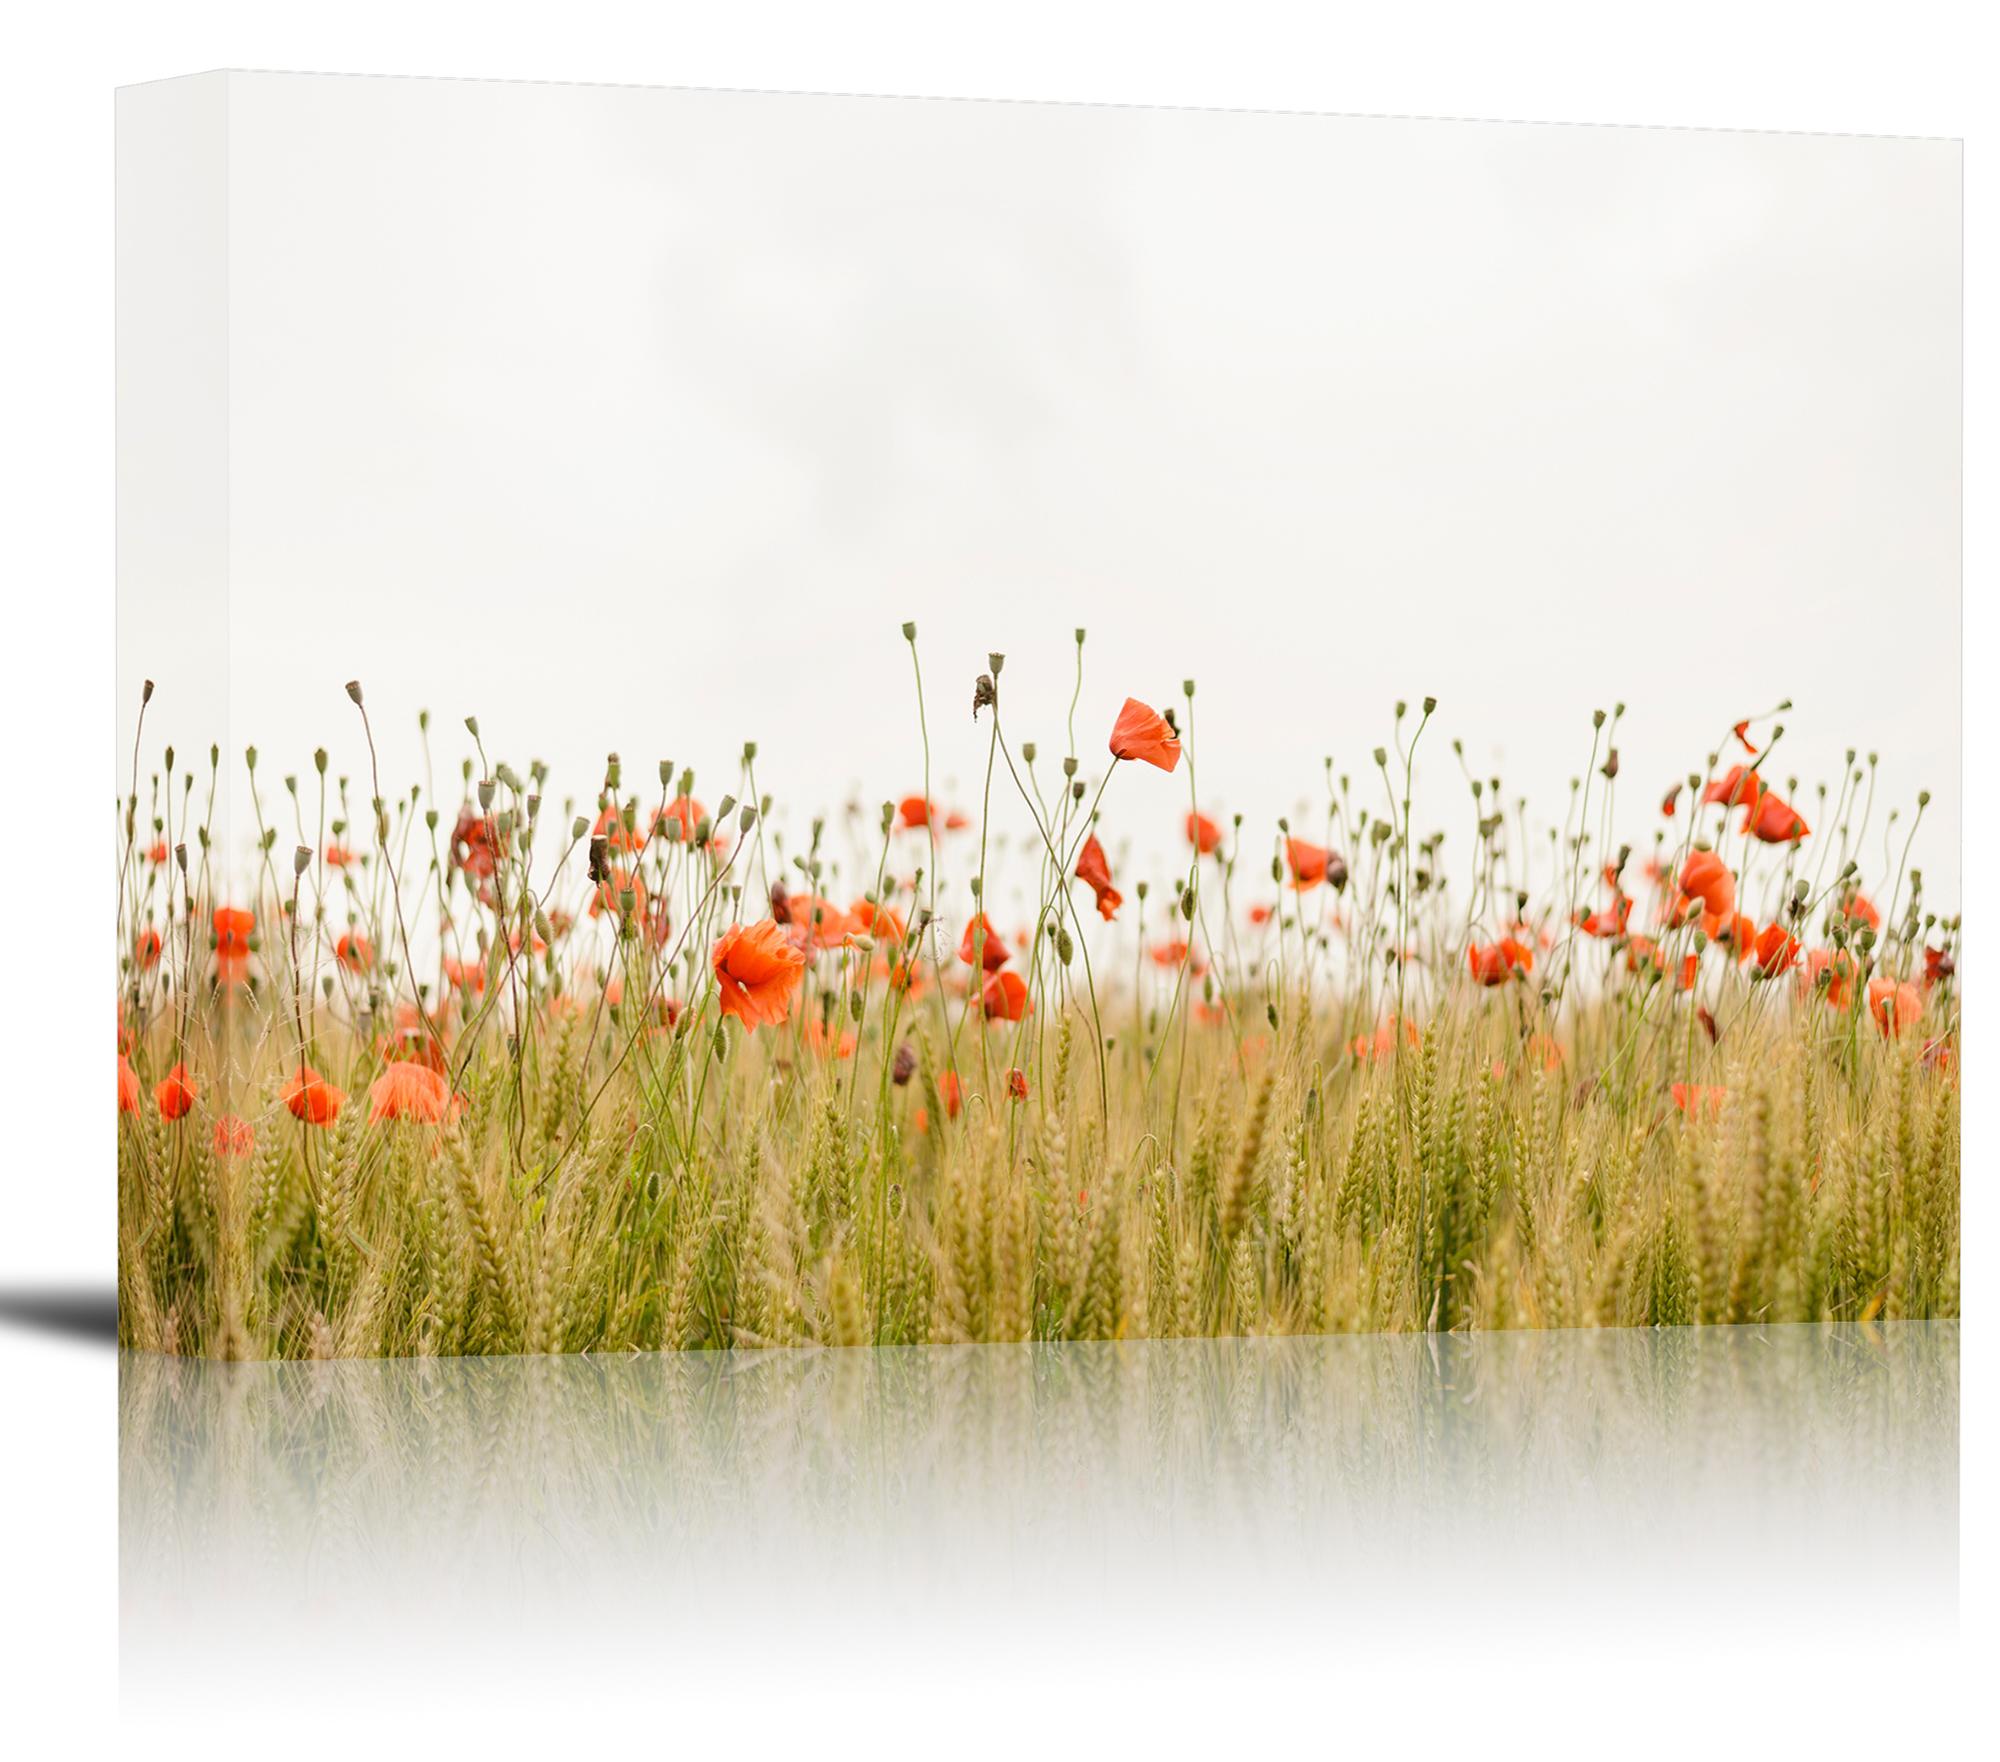 Red Poppy Flowers Wheat Field Art Print Wall Decor - Canvas ...